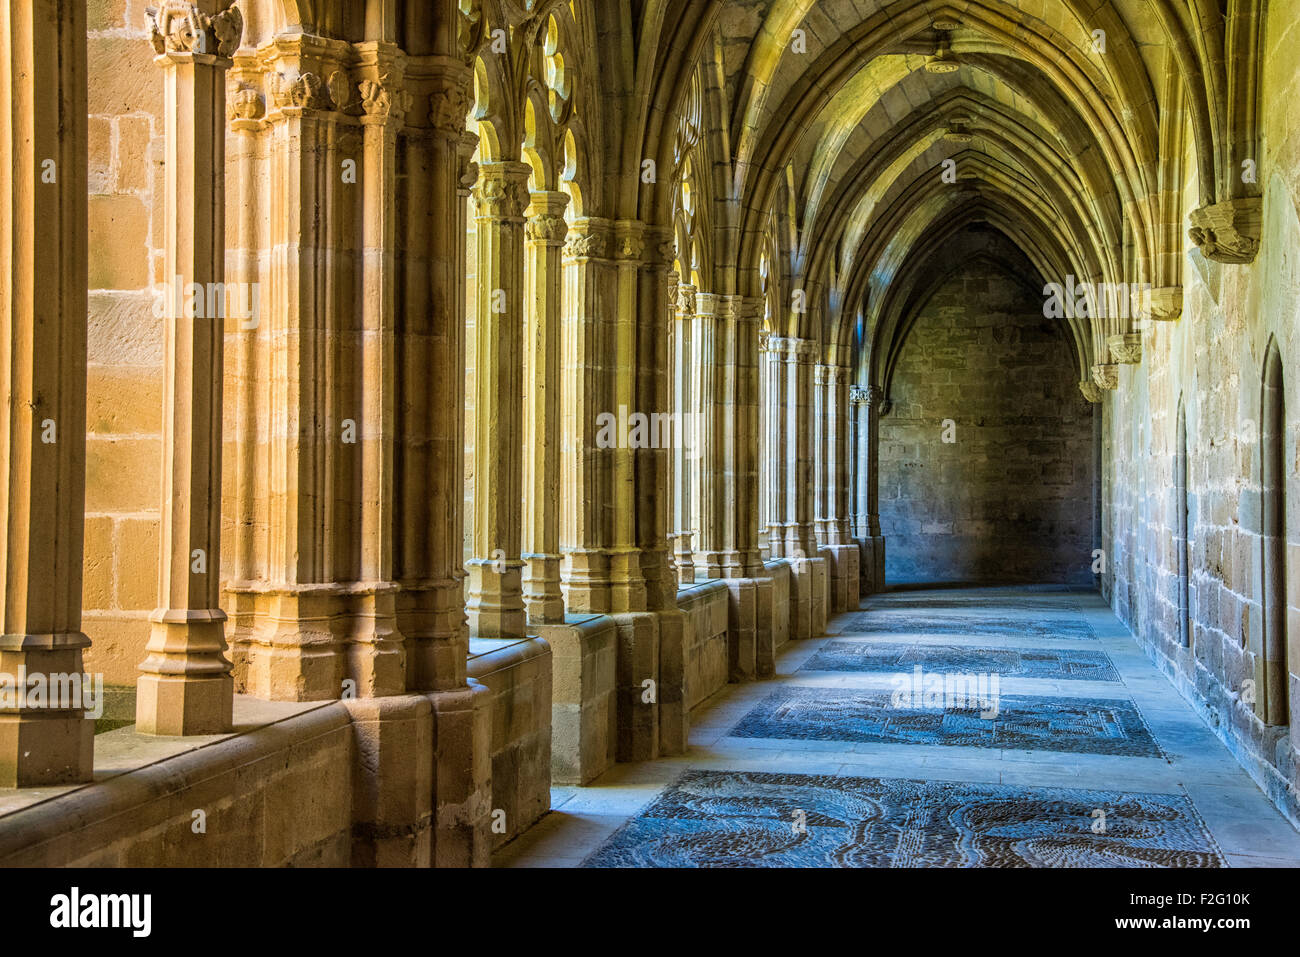 Gothic cloister of the Monastery of La Oliva, 12-13 centuries, Navarre, Spain Stock Photo